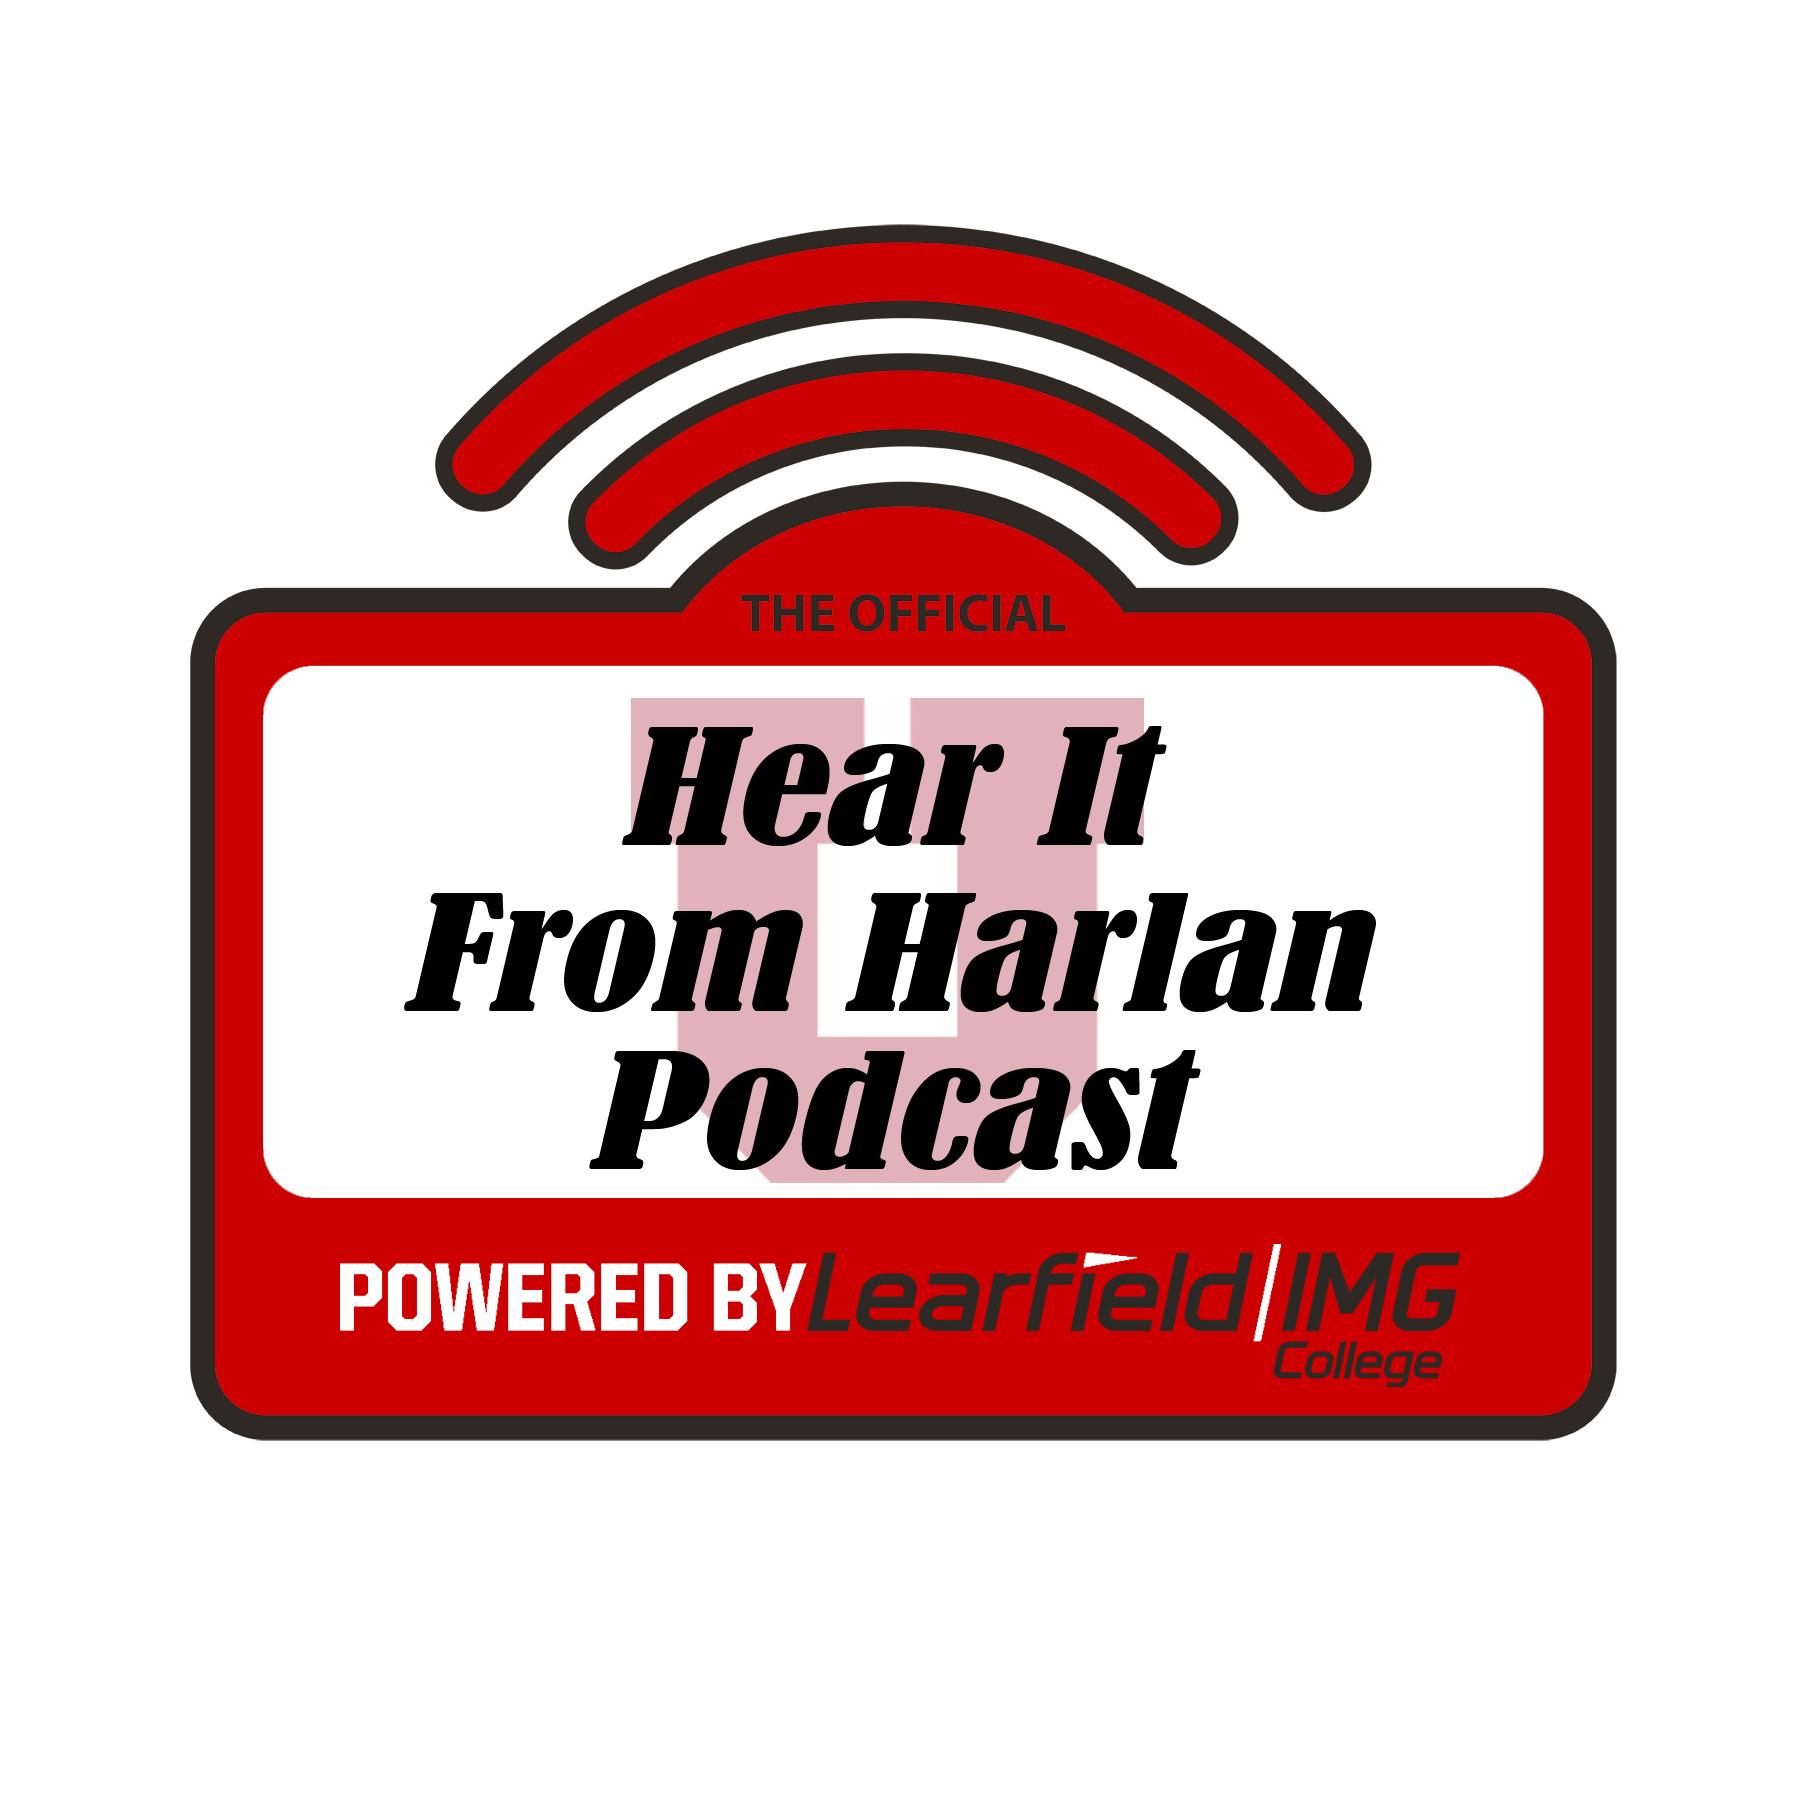 Hear it from Harlan